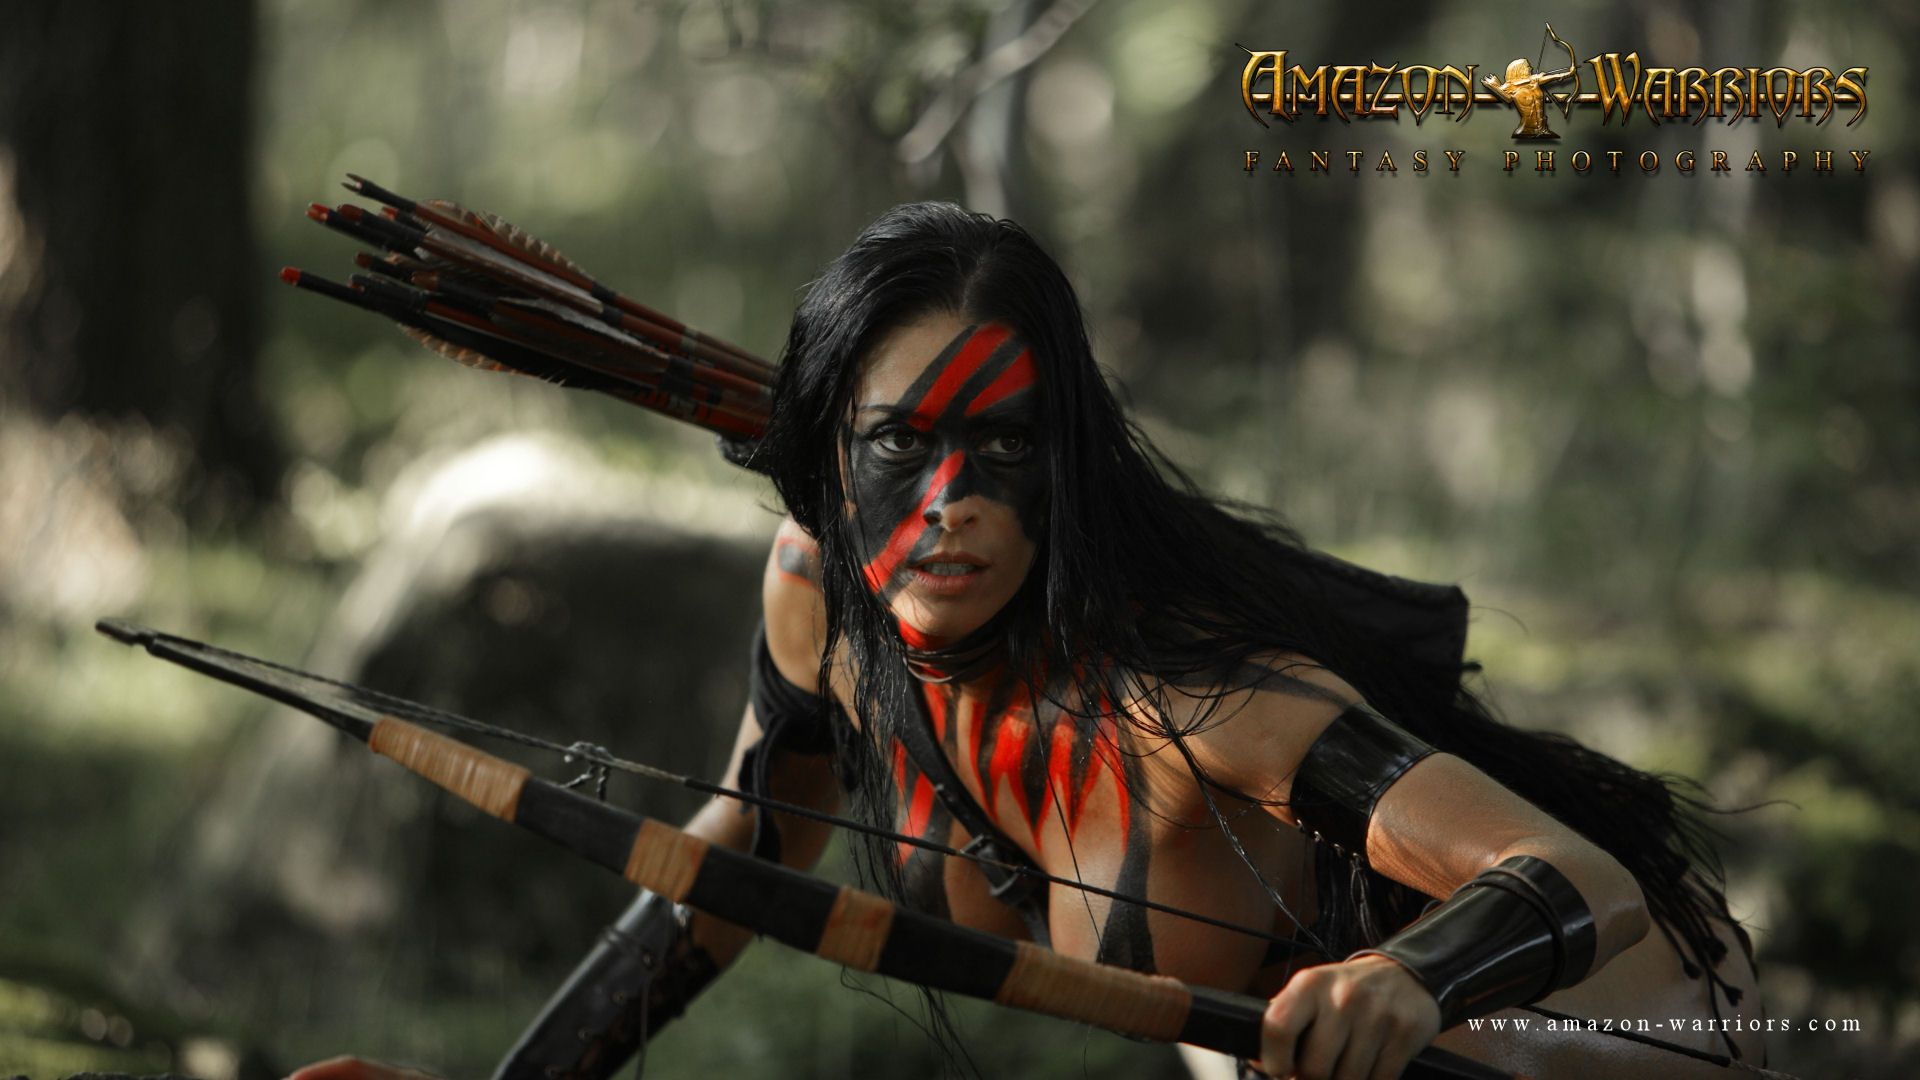 Amazon Warriors Fotos startseite - amazon-warriors - startseite | wonder woman